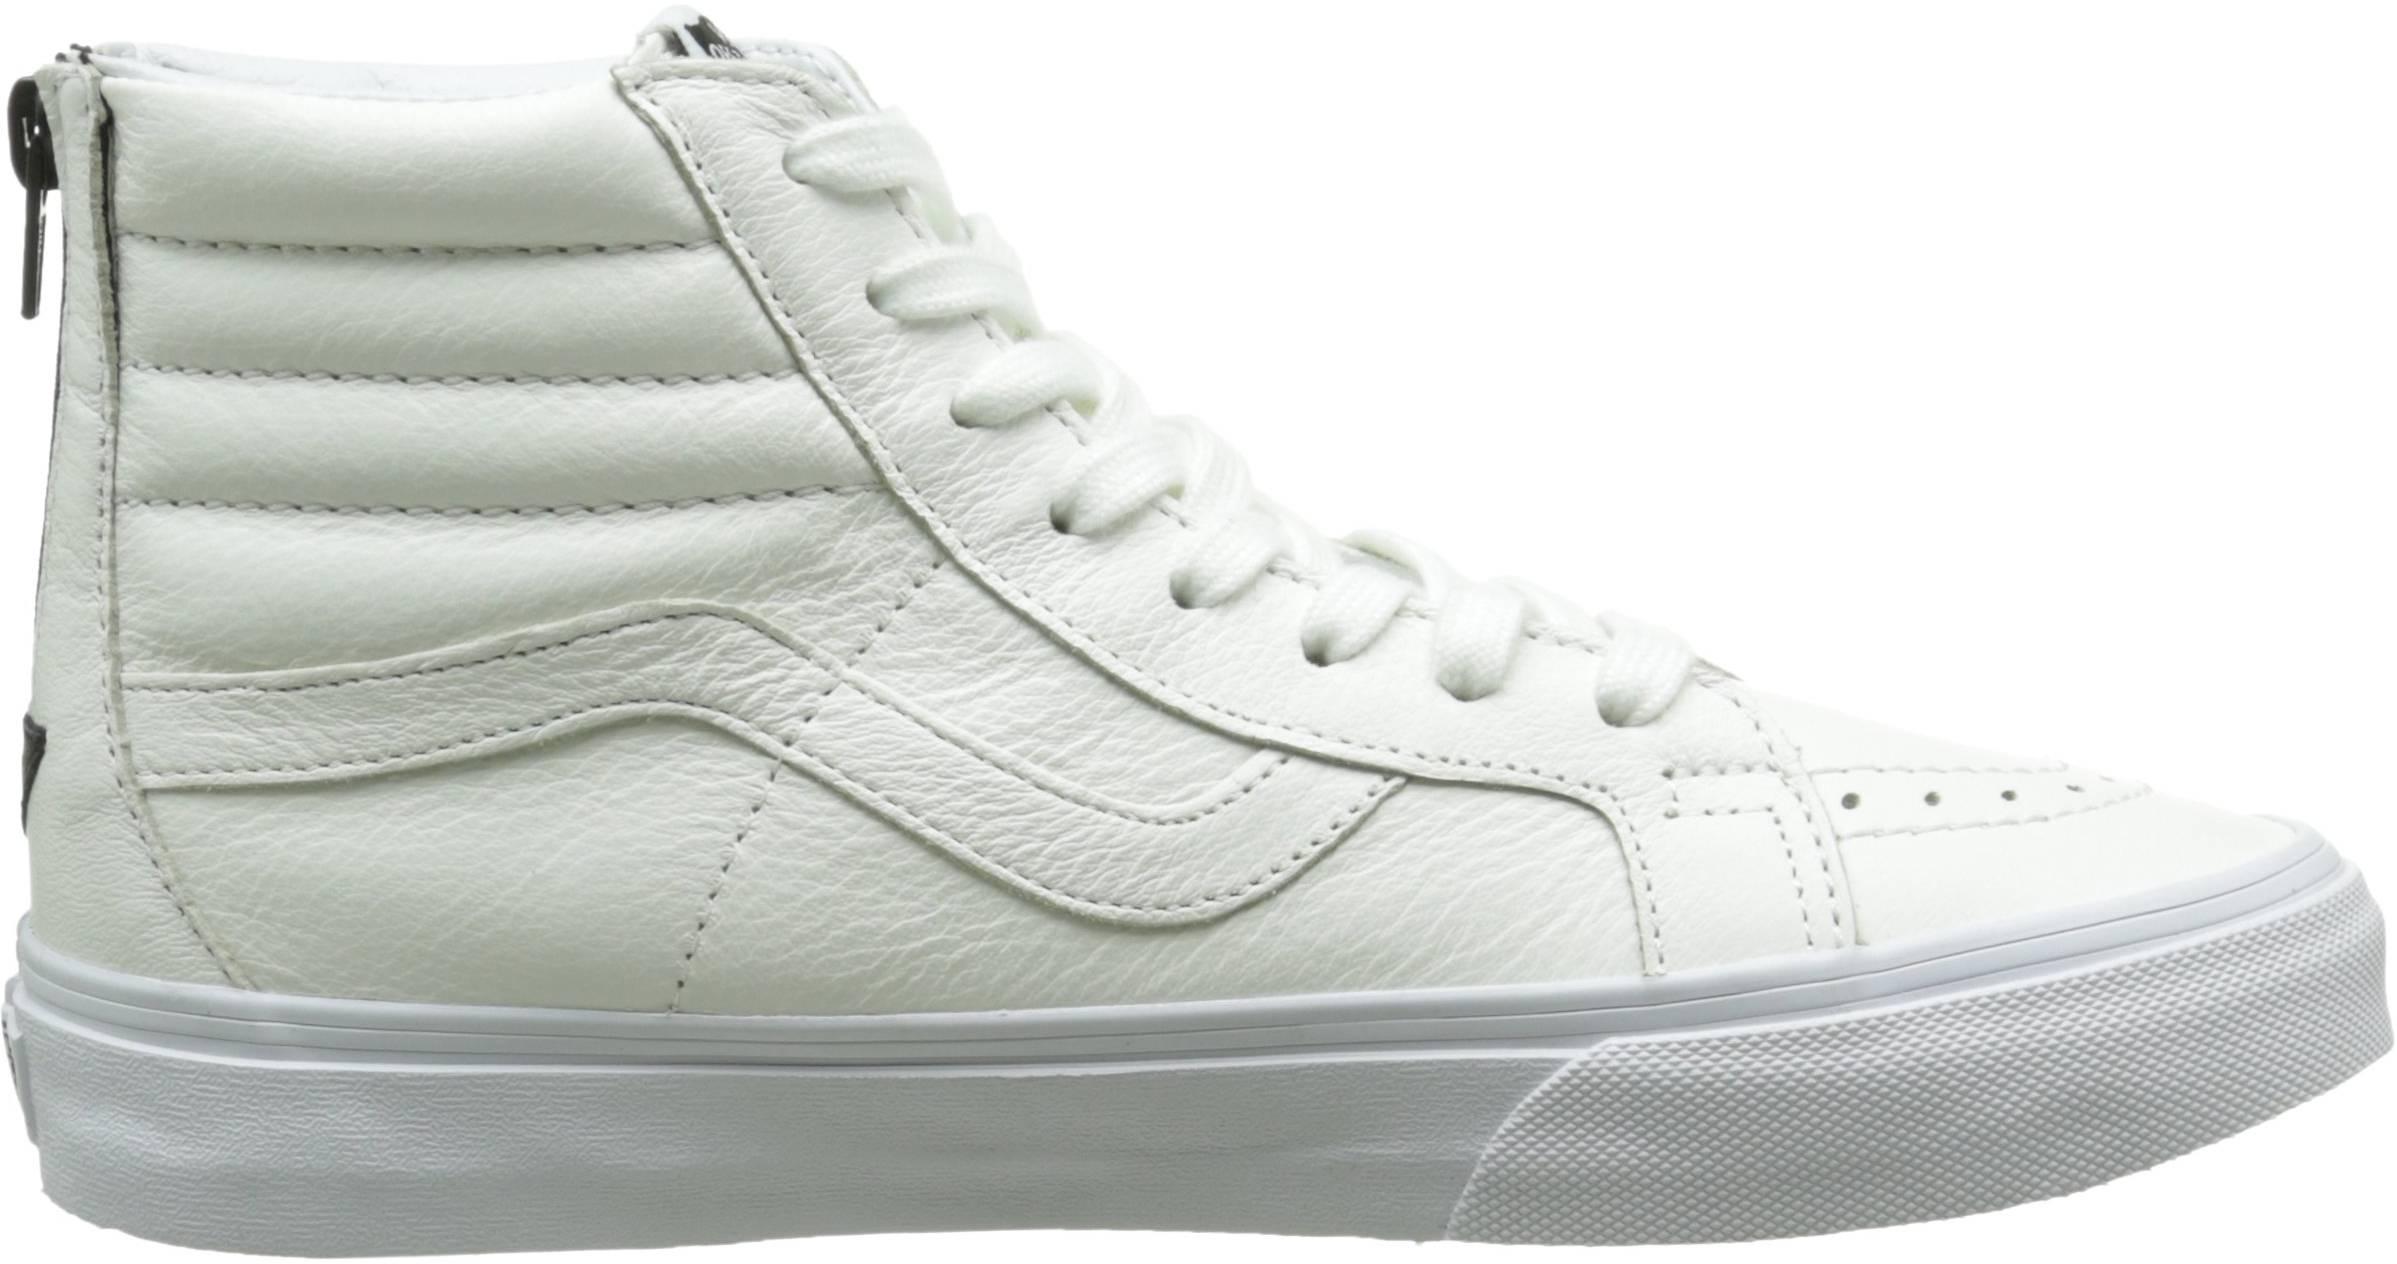 Save 17% on Vans Zipper Sneakers (4